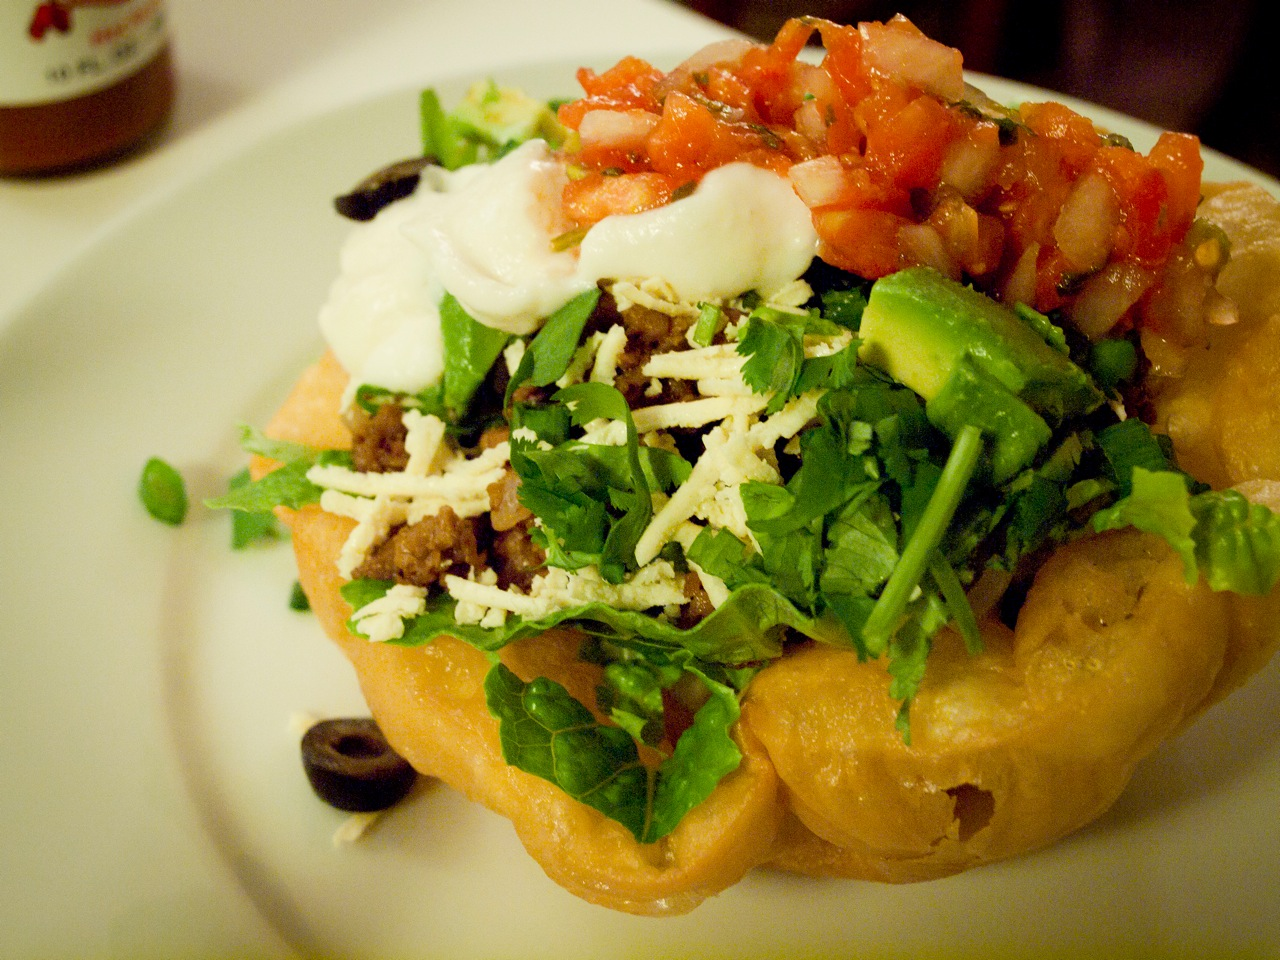 It's true, vegans love salad. Including taco salad.